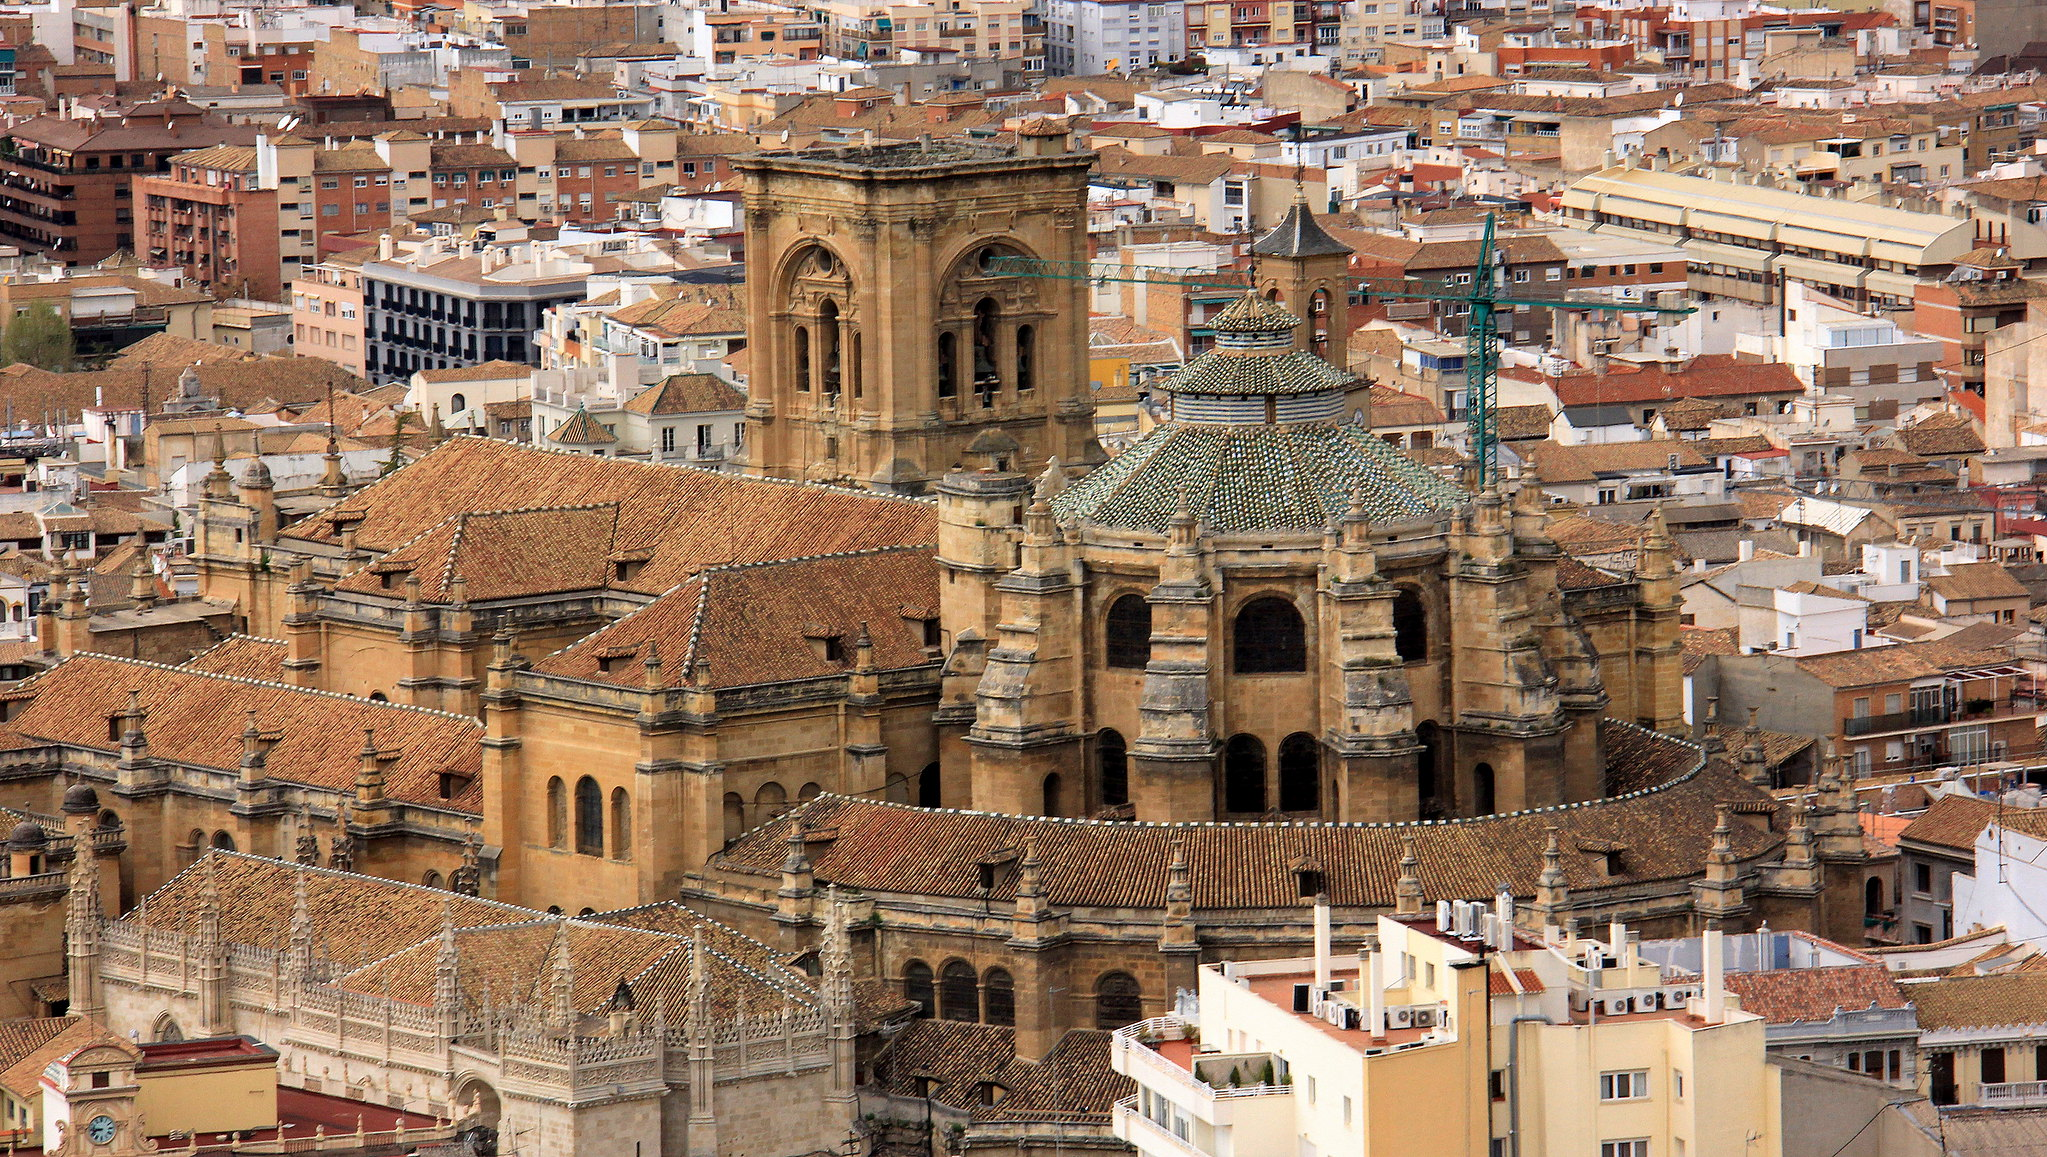 Granada from a bird's eye view